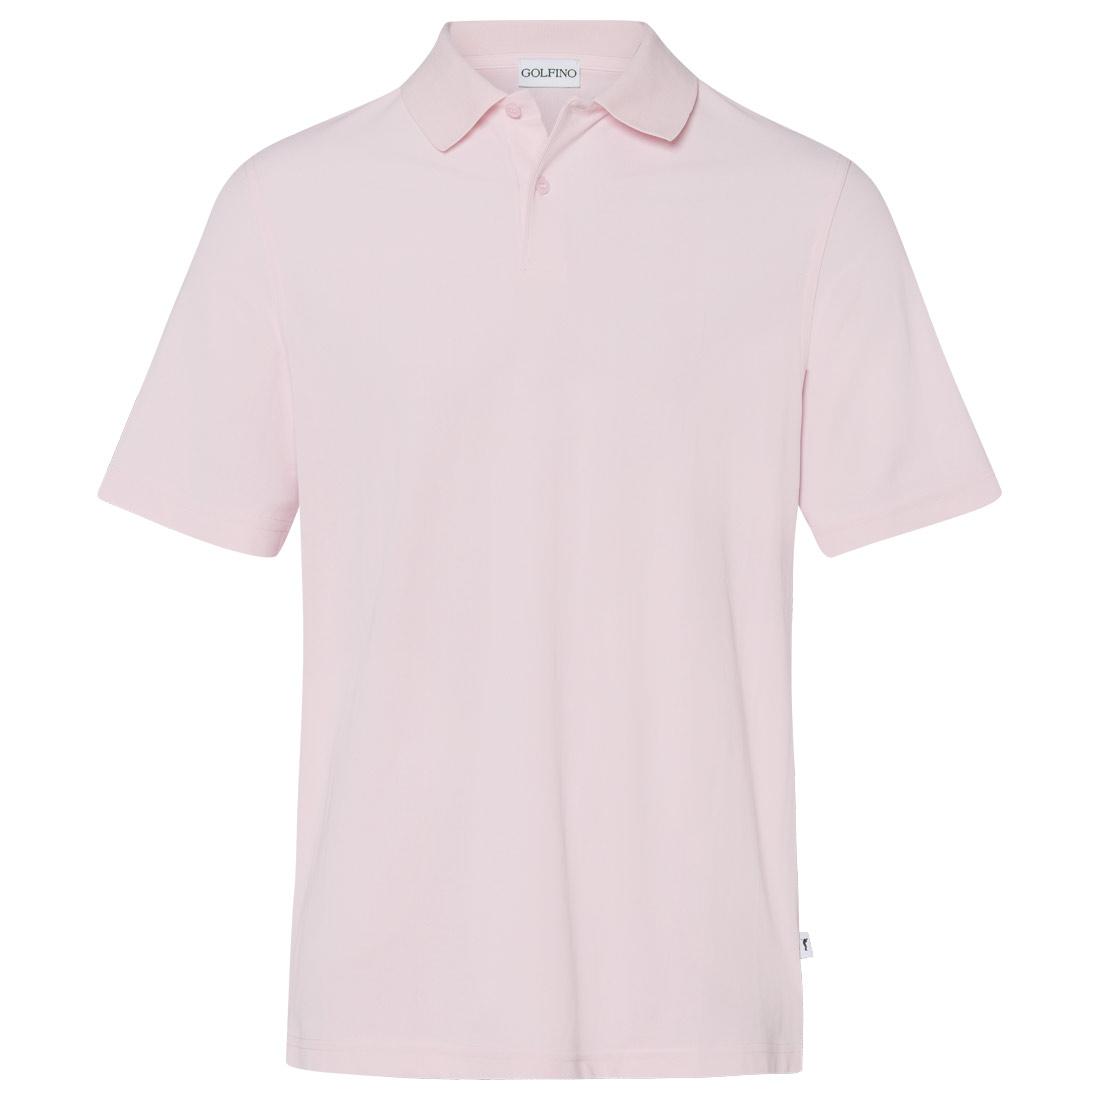 Extra Dry Kurzarm Golf Poloshirt